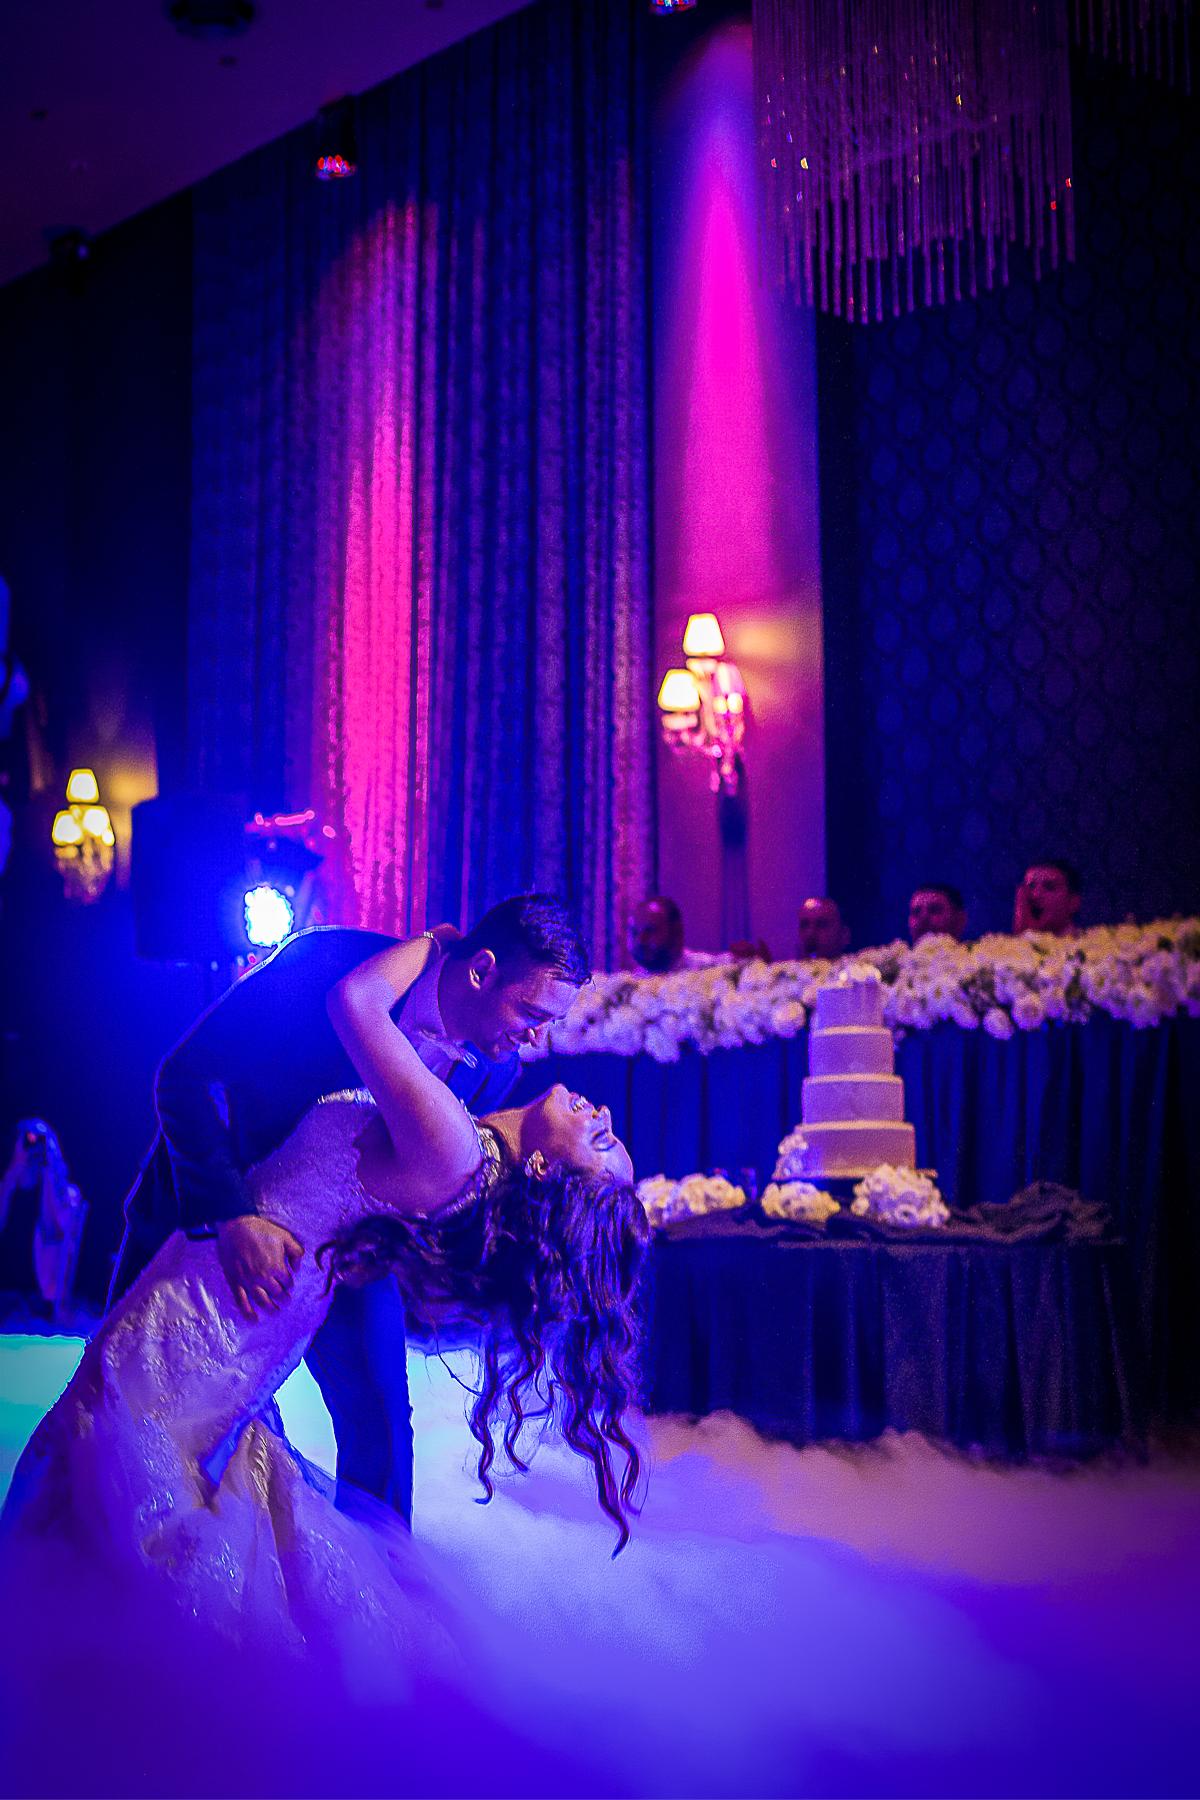 Amazing Loving First Dance at Renaissance Westella Lidcombe Grand Ballroom | Fantasie Photography